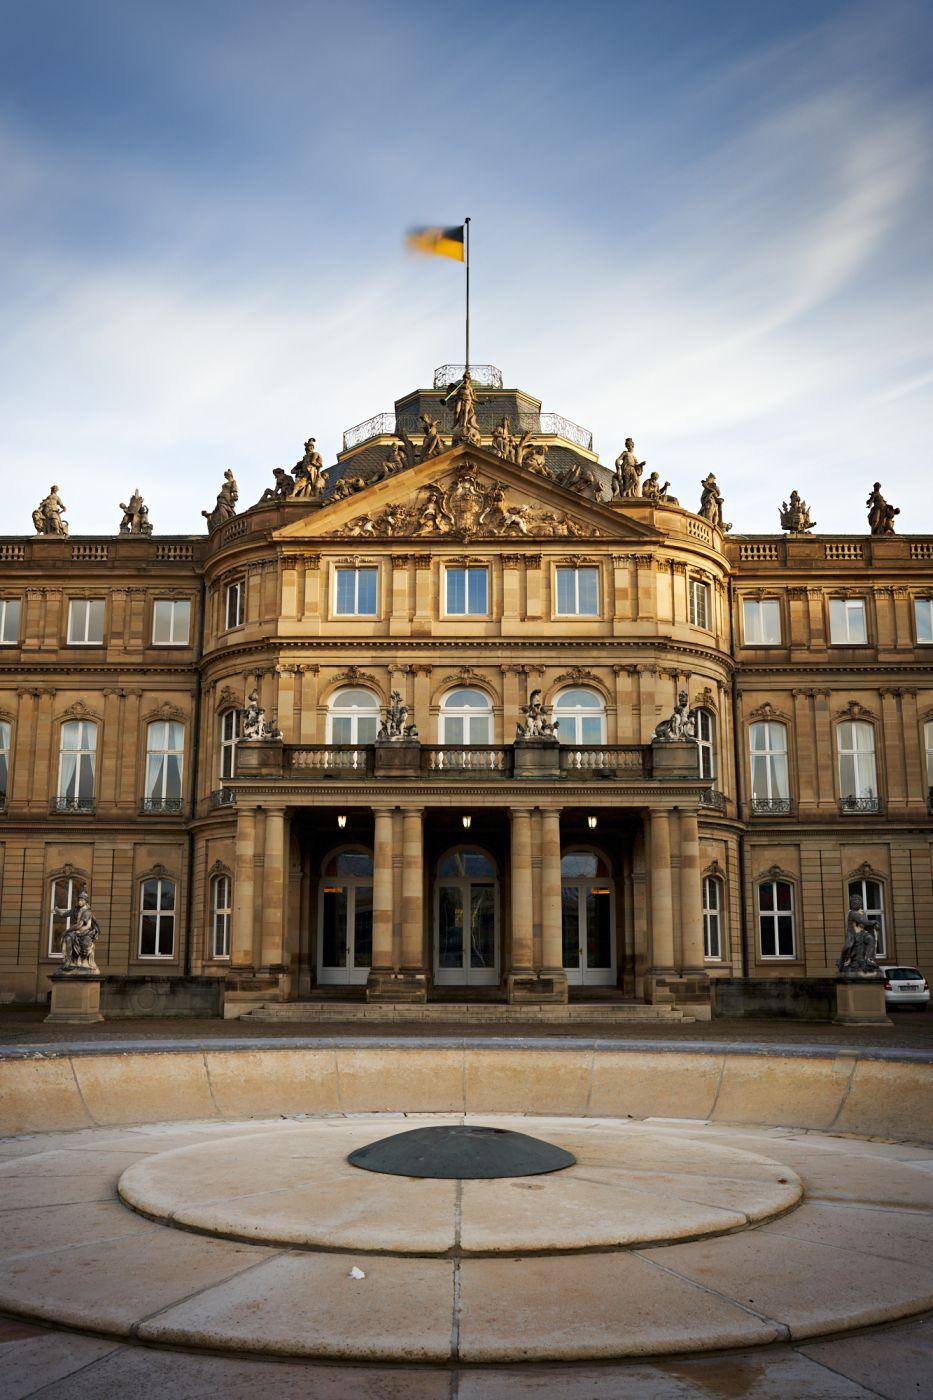 Neues Schloss, Germany